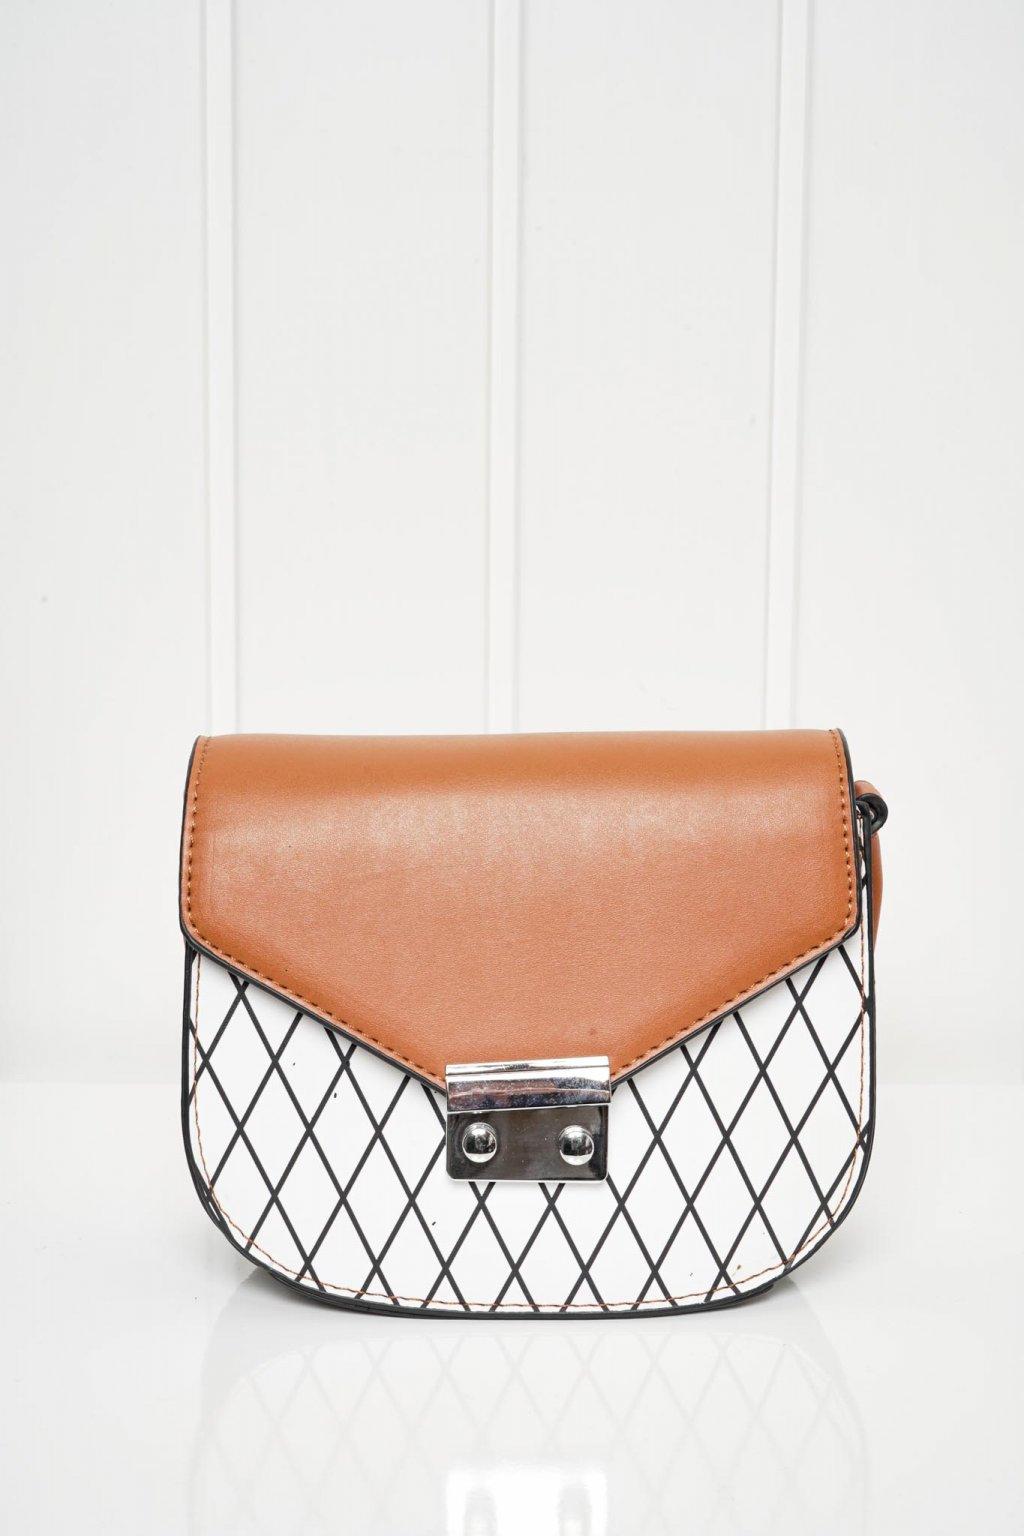 Kabelka, crossbody, ruksak, shopping bag, shopperka, 247